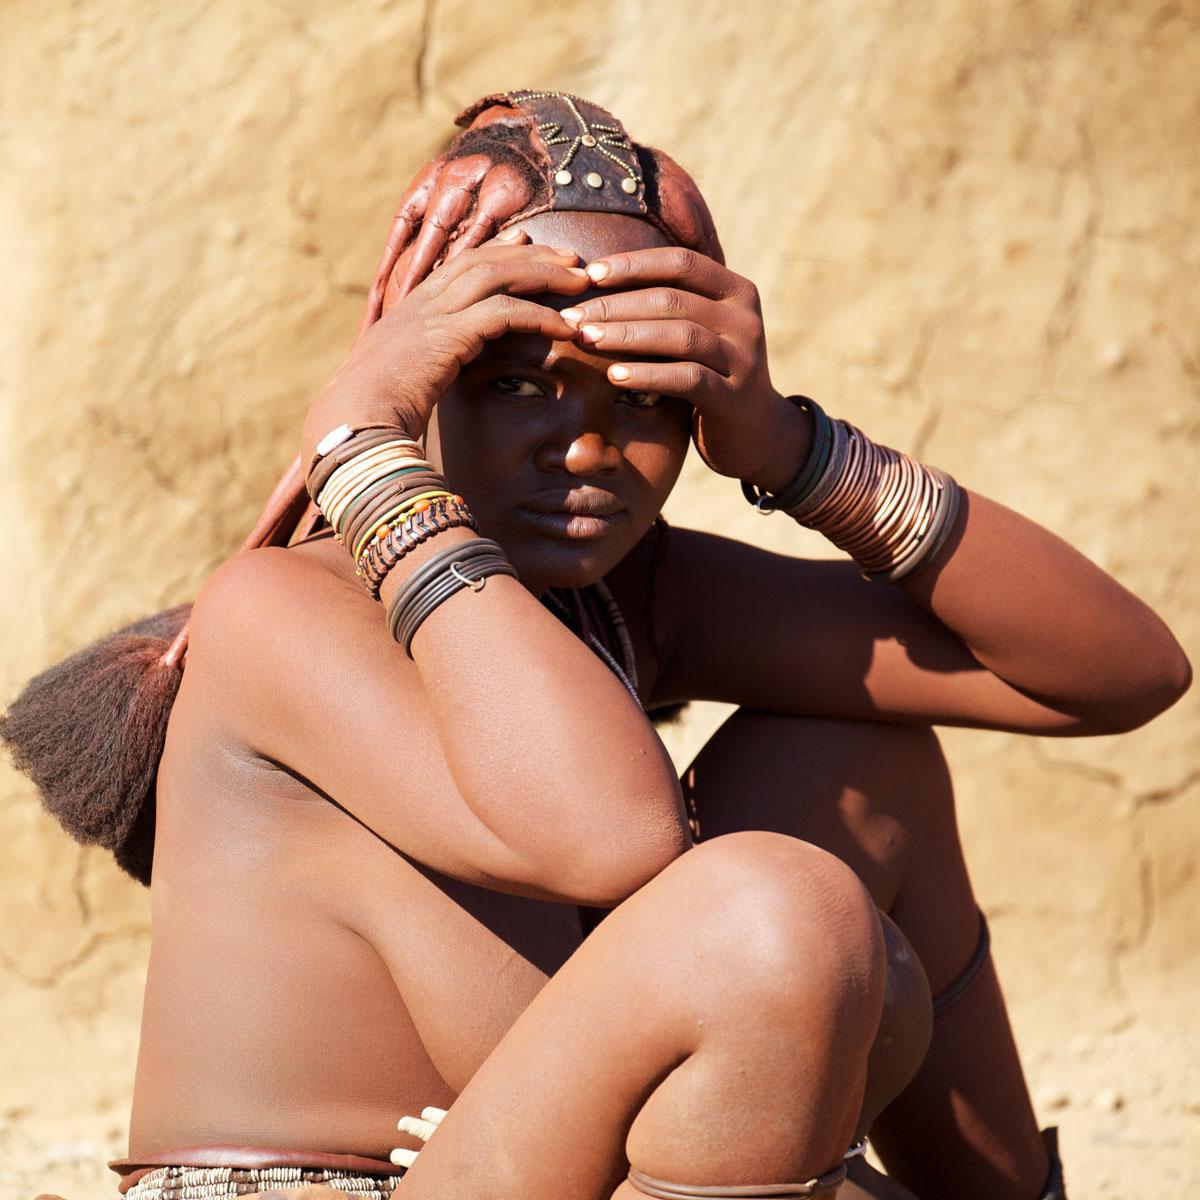 namibia_013_SP